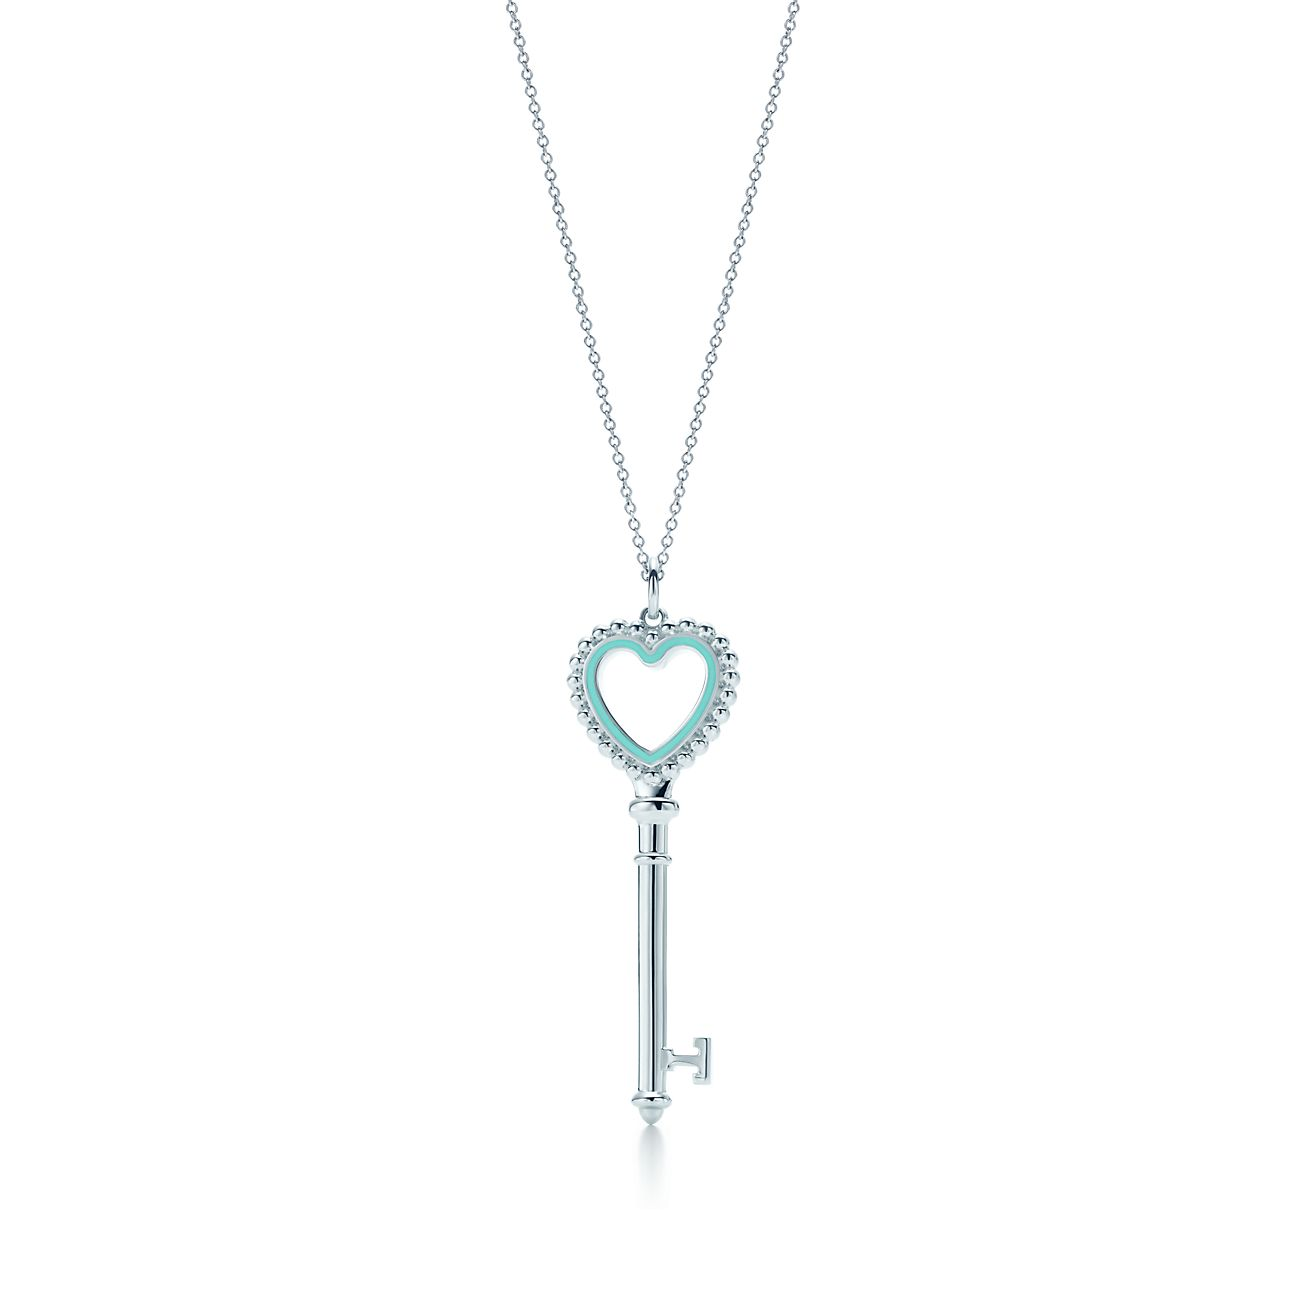 Tiffany keys beaded heart key pendant in silver with enamel finish tiffany keysbeaded heart key pendant aloadofball Image collections